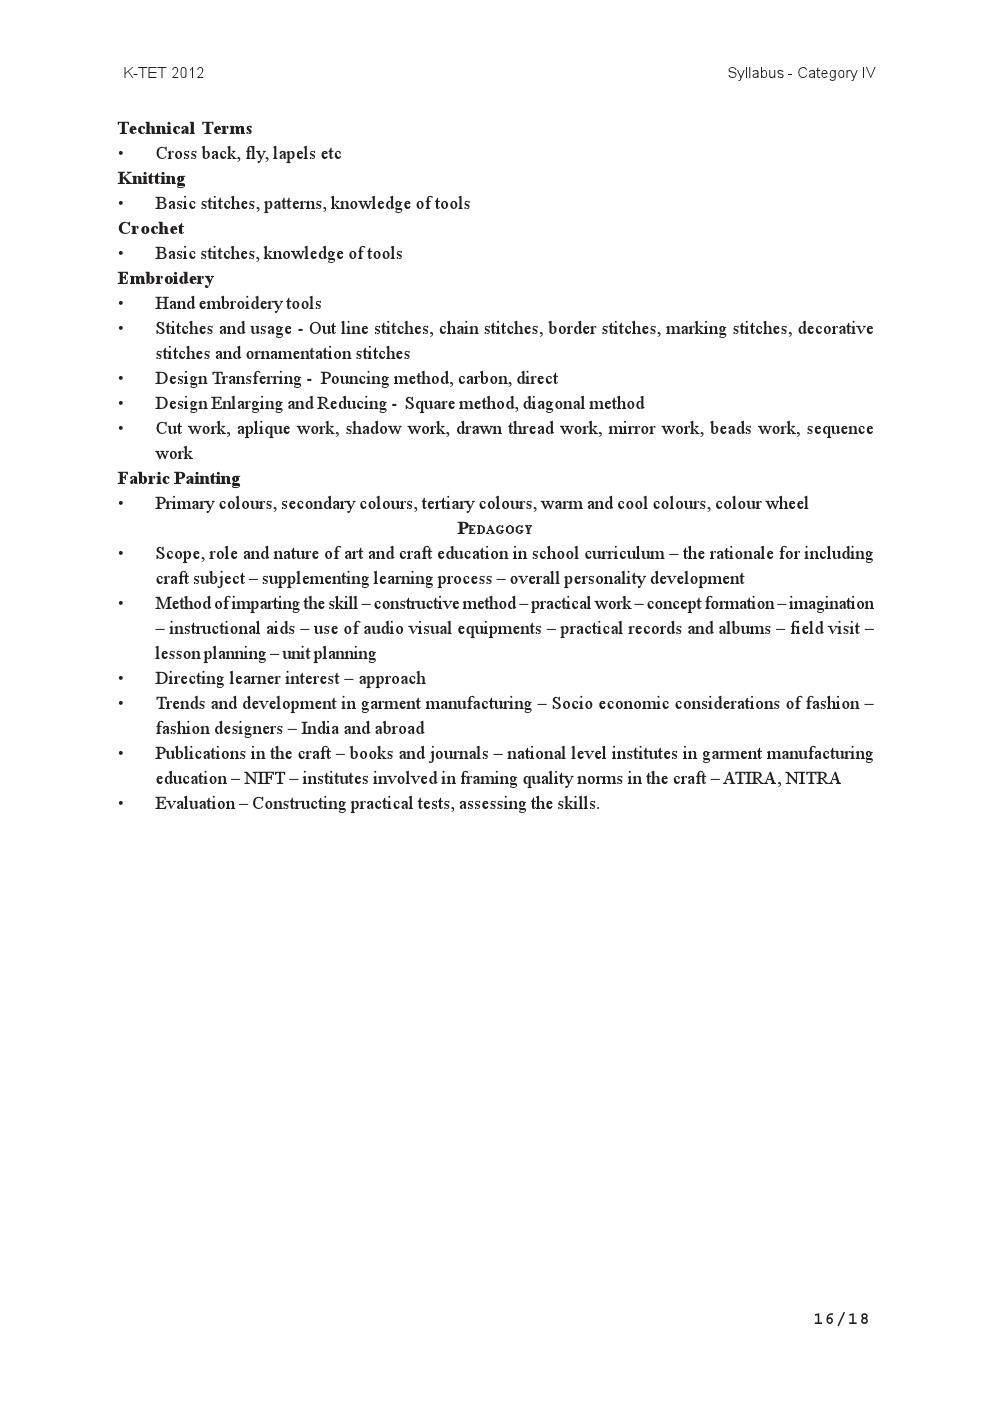 http://masterstudy.net/pdf/syllabus40016.jpg